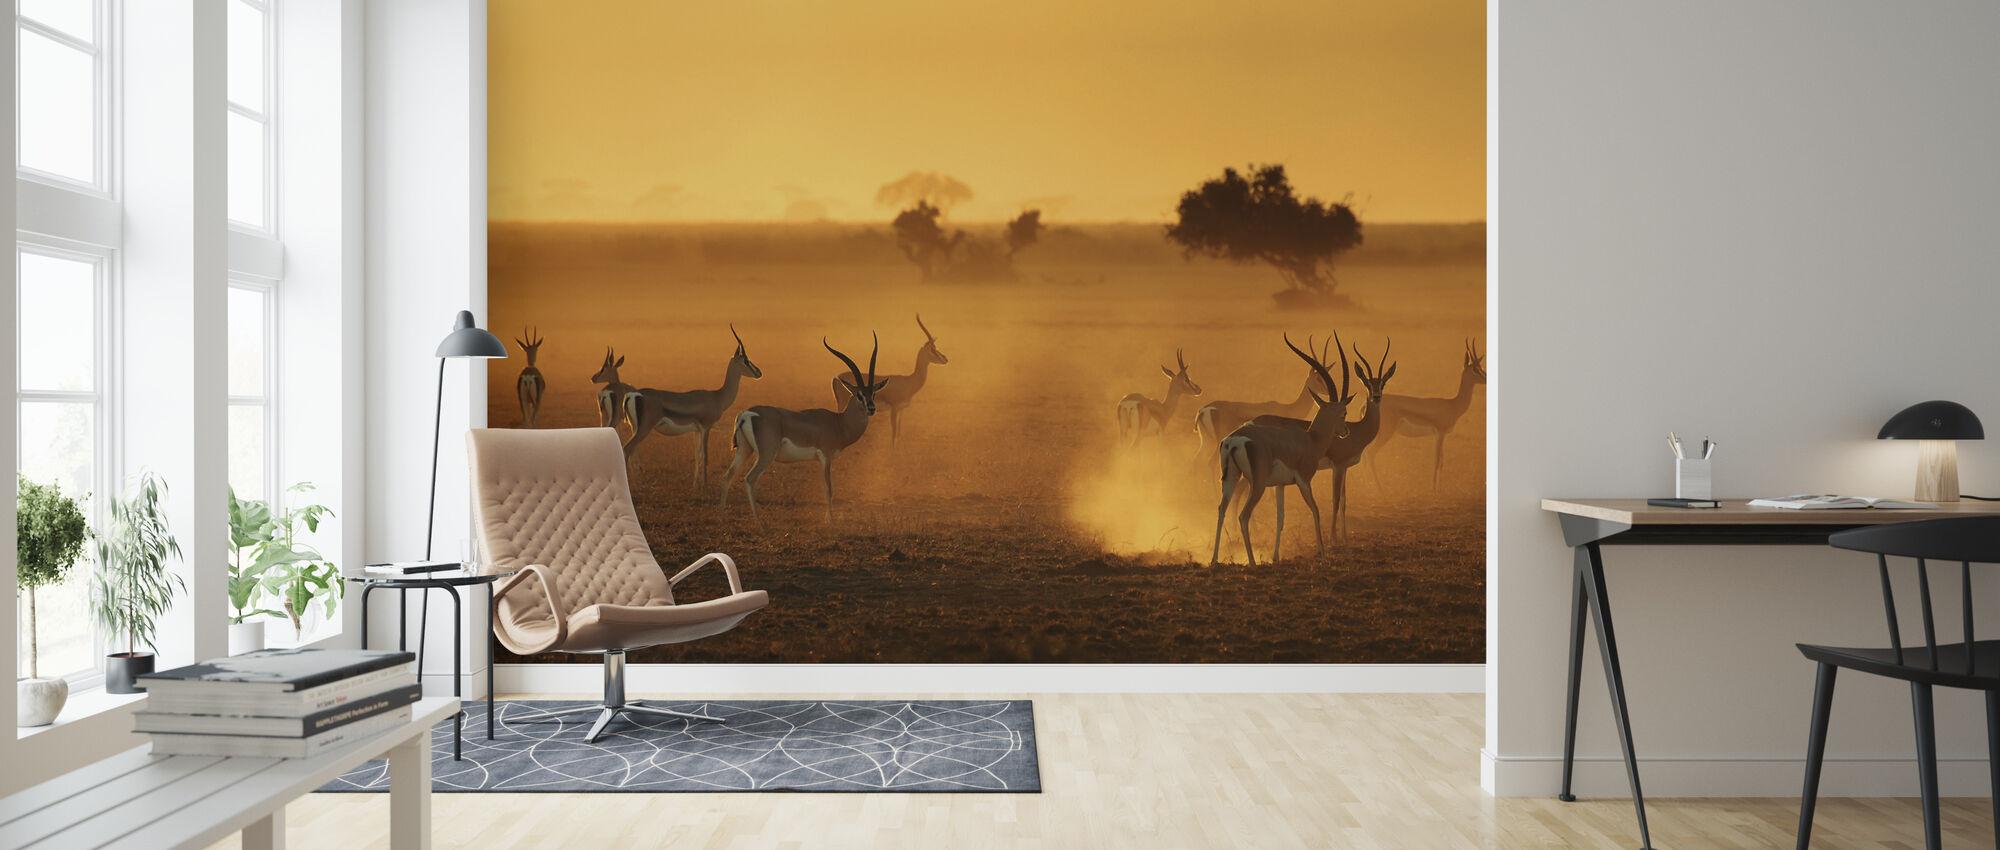 Sentinels - Wallpaper - Living Room